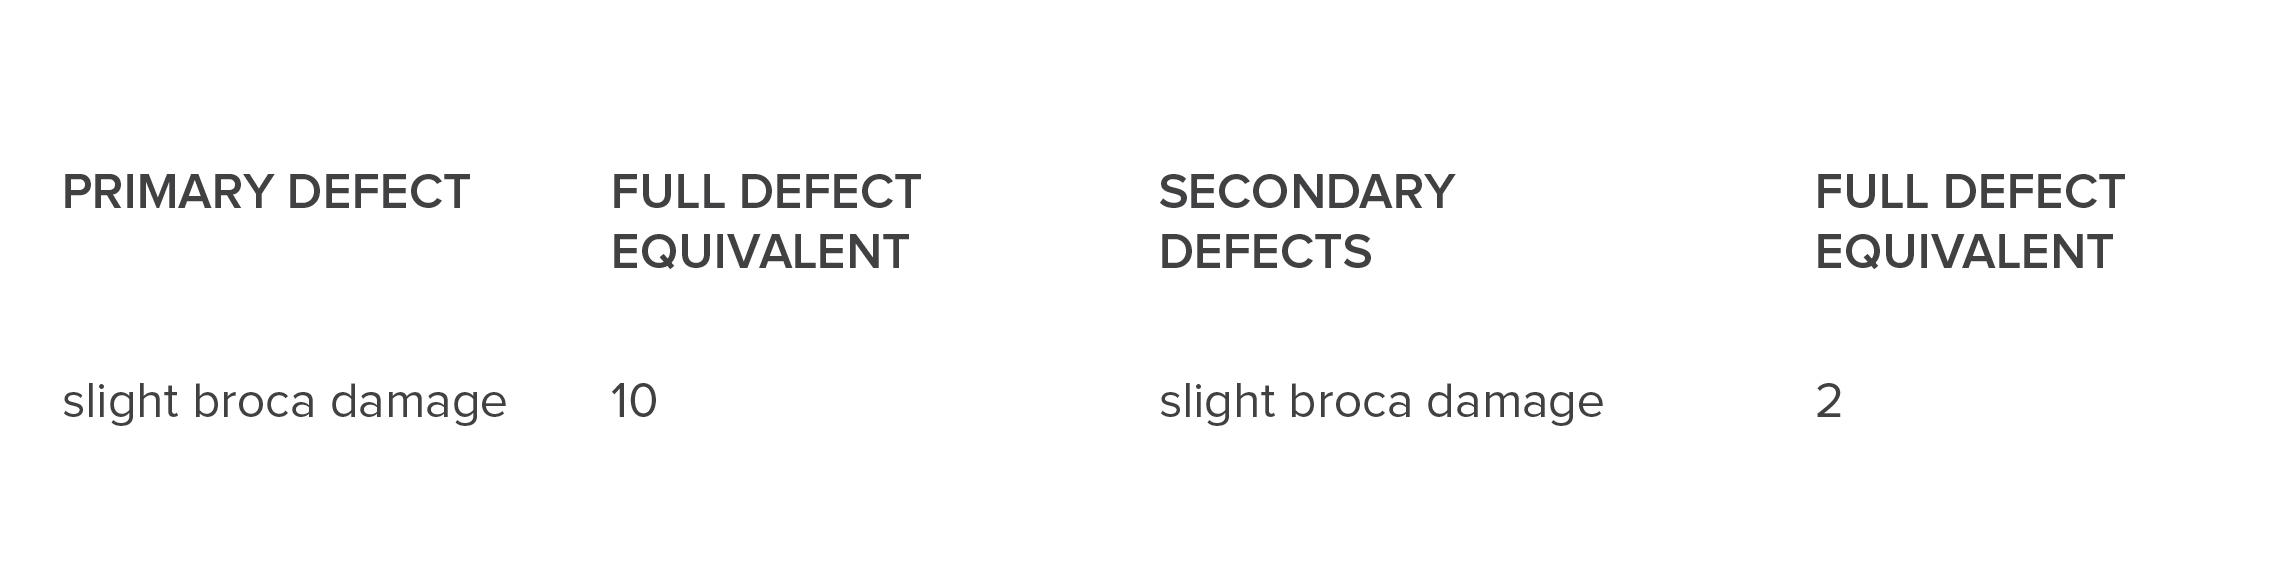 Broca Classification Colombia.jpg